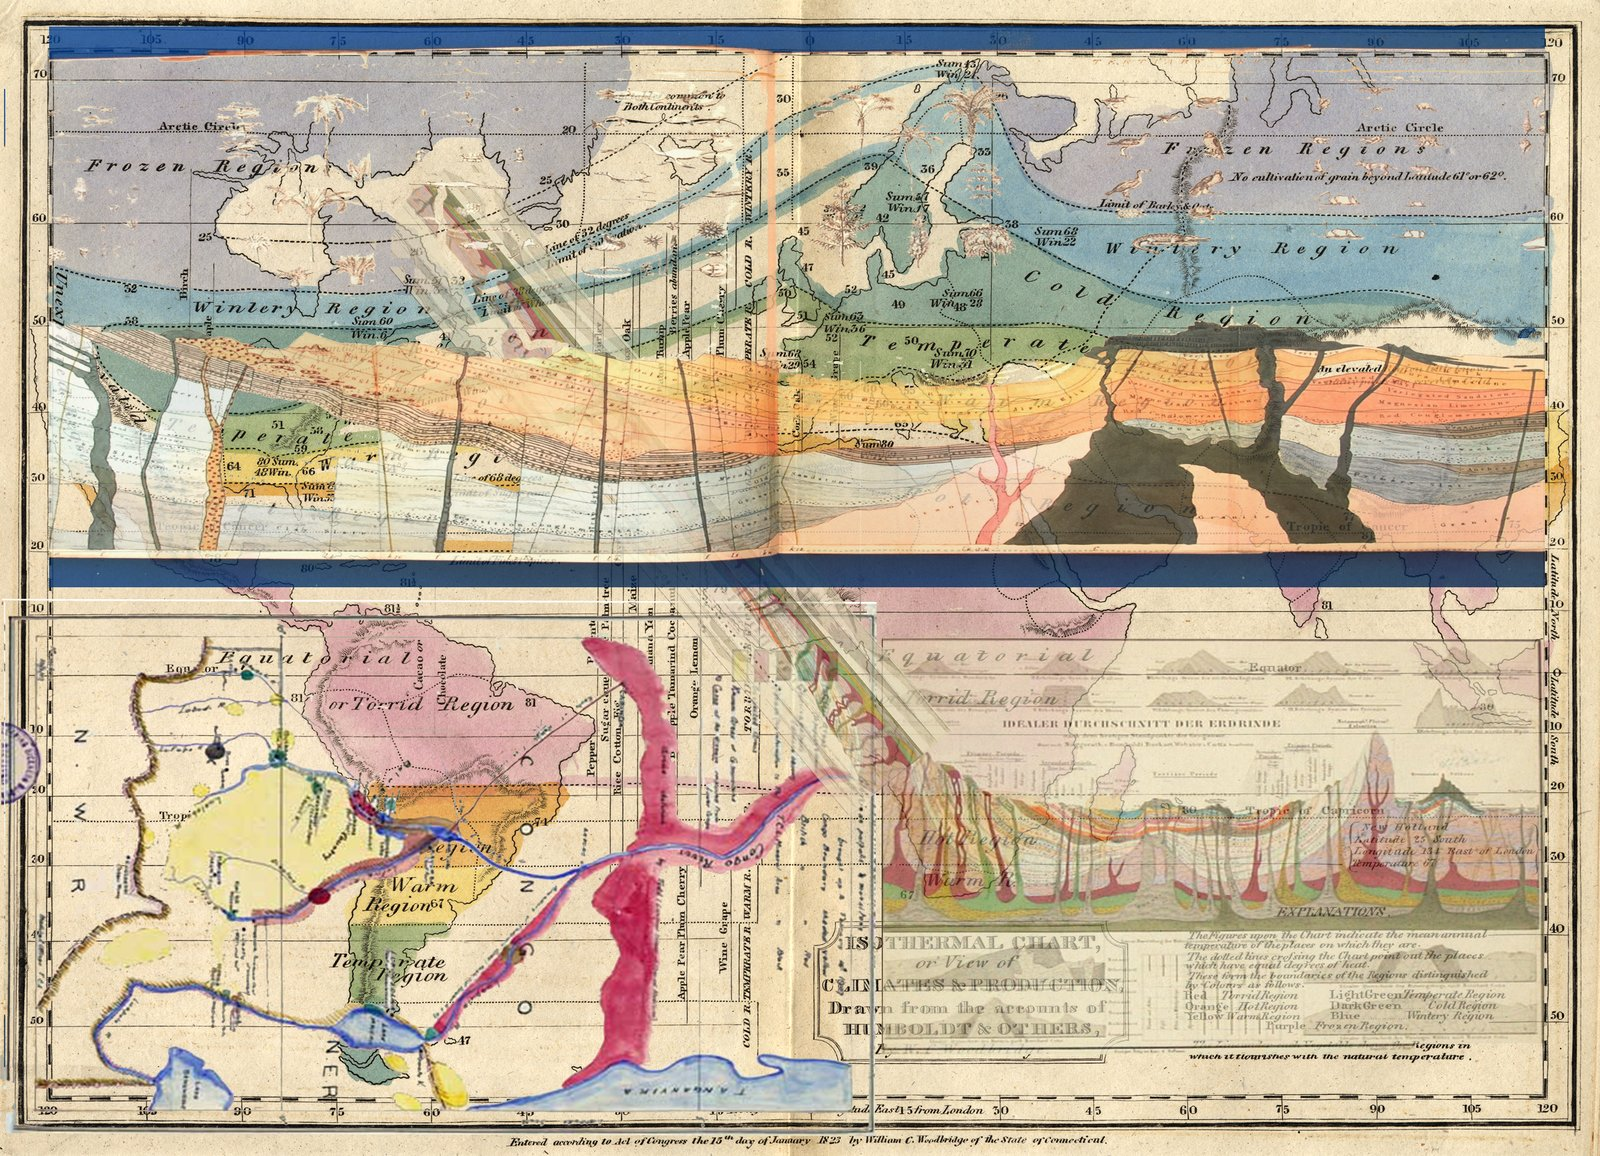 Detailed Drawings From Ethnobotonaist Alexander Von Humboldt